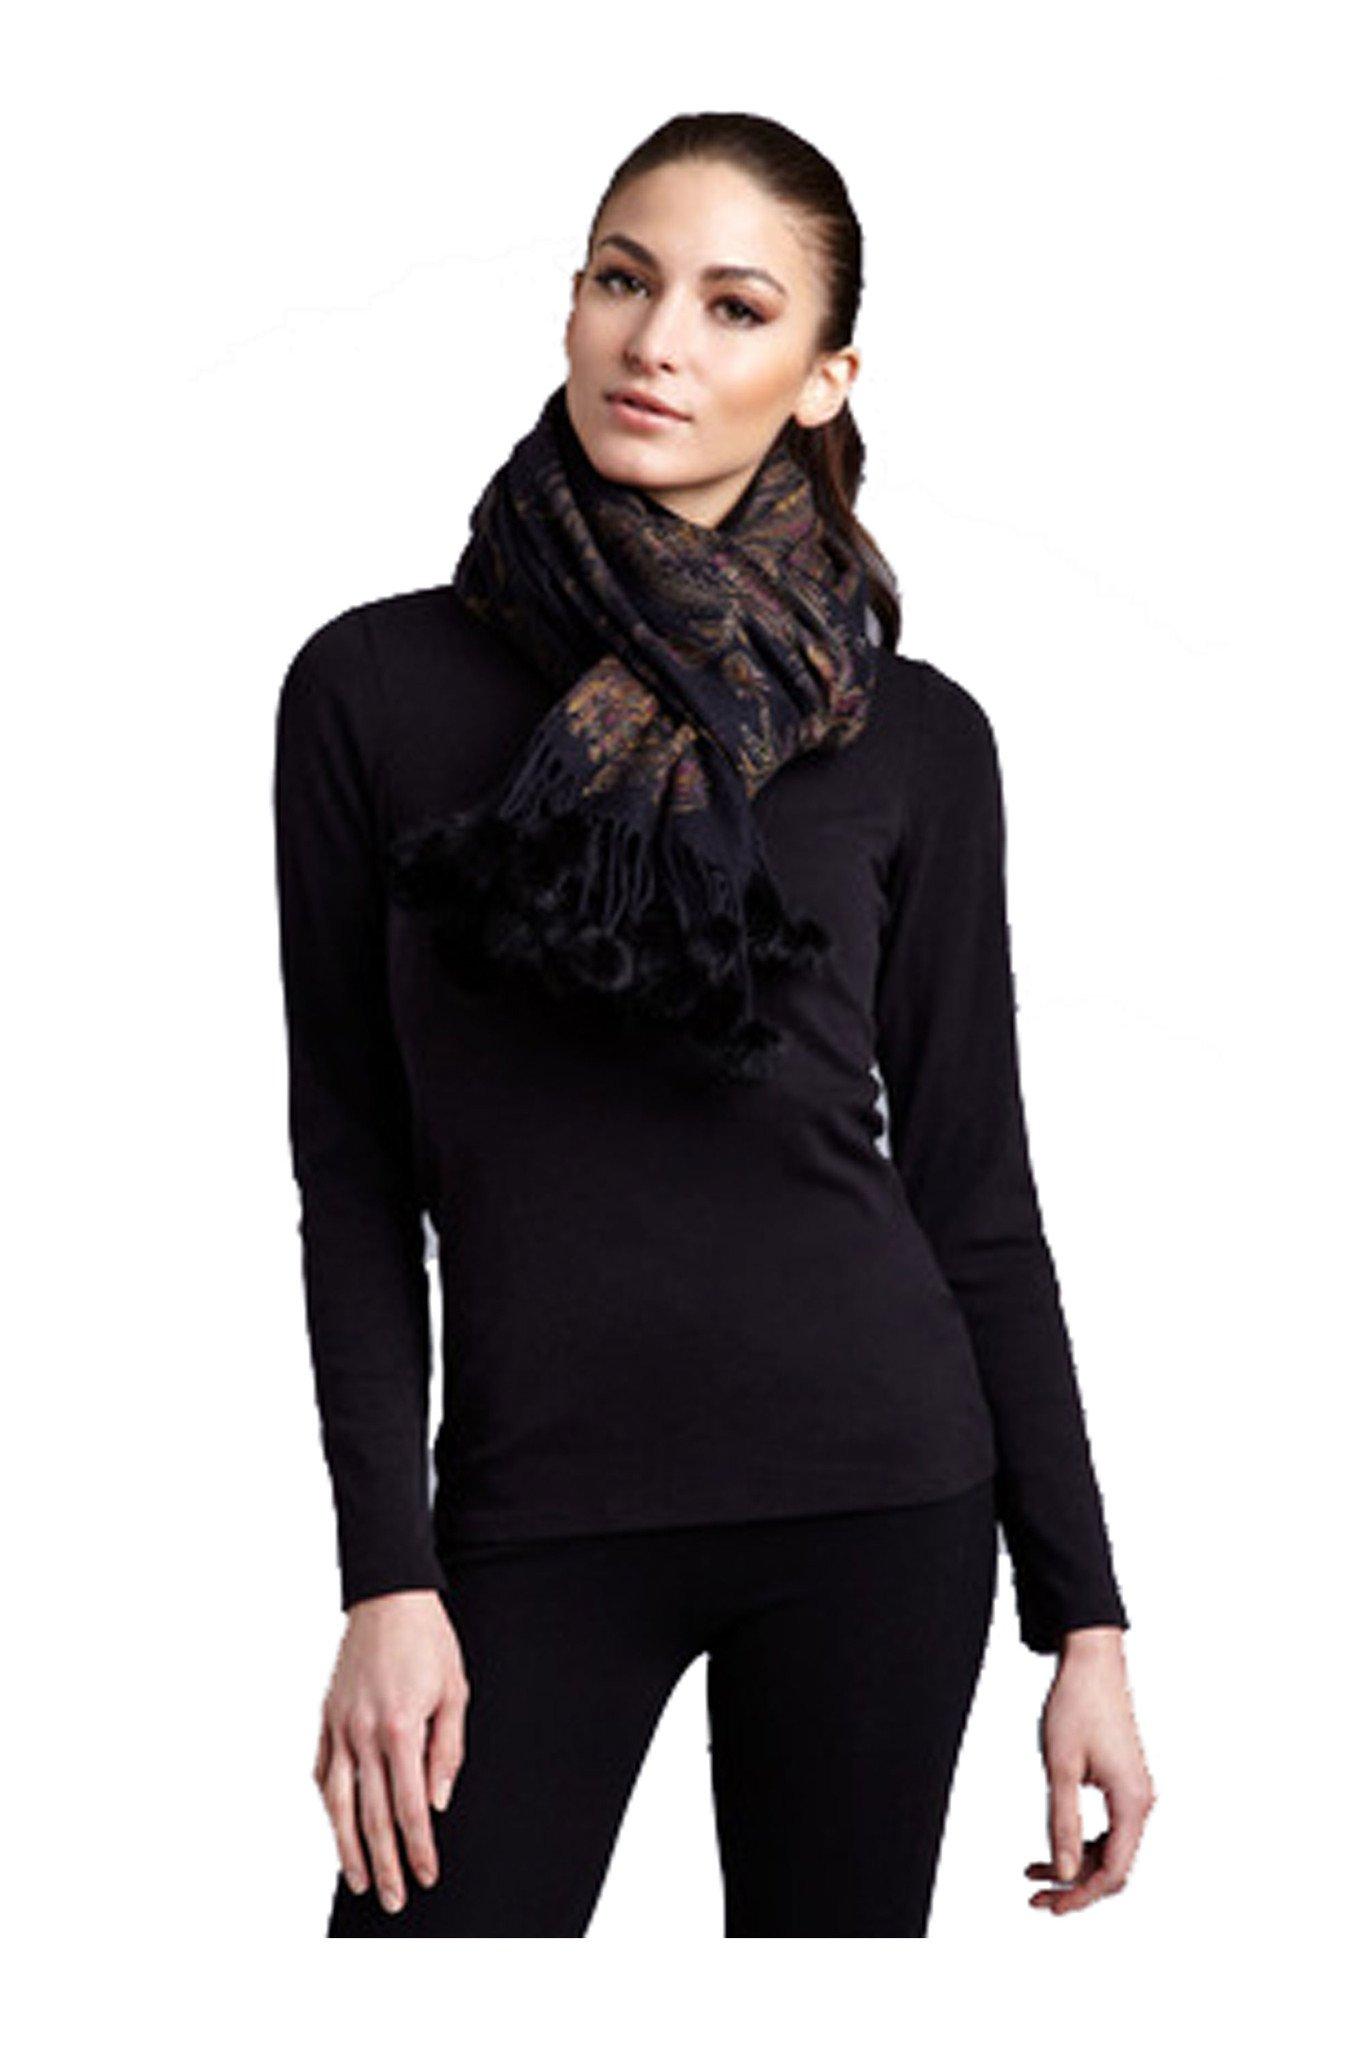 Cashmere Pashmina Group-Cashmere Shawl Scarf Wrap Stole (Solid/ Reversible Print w/ Genuine Fur) - Mink Black